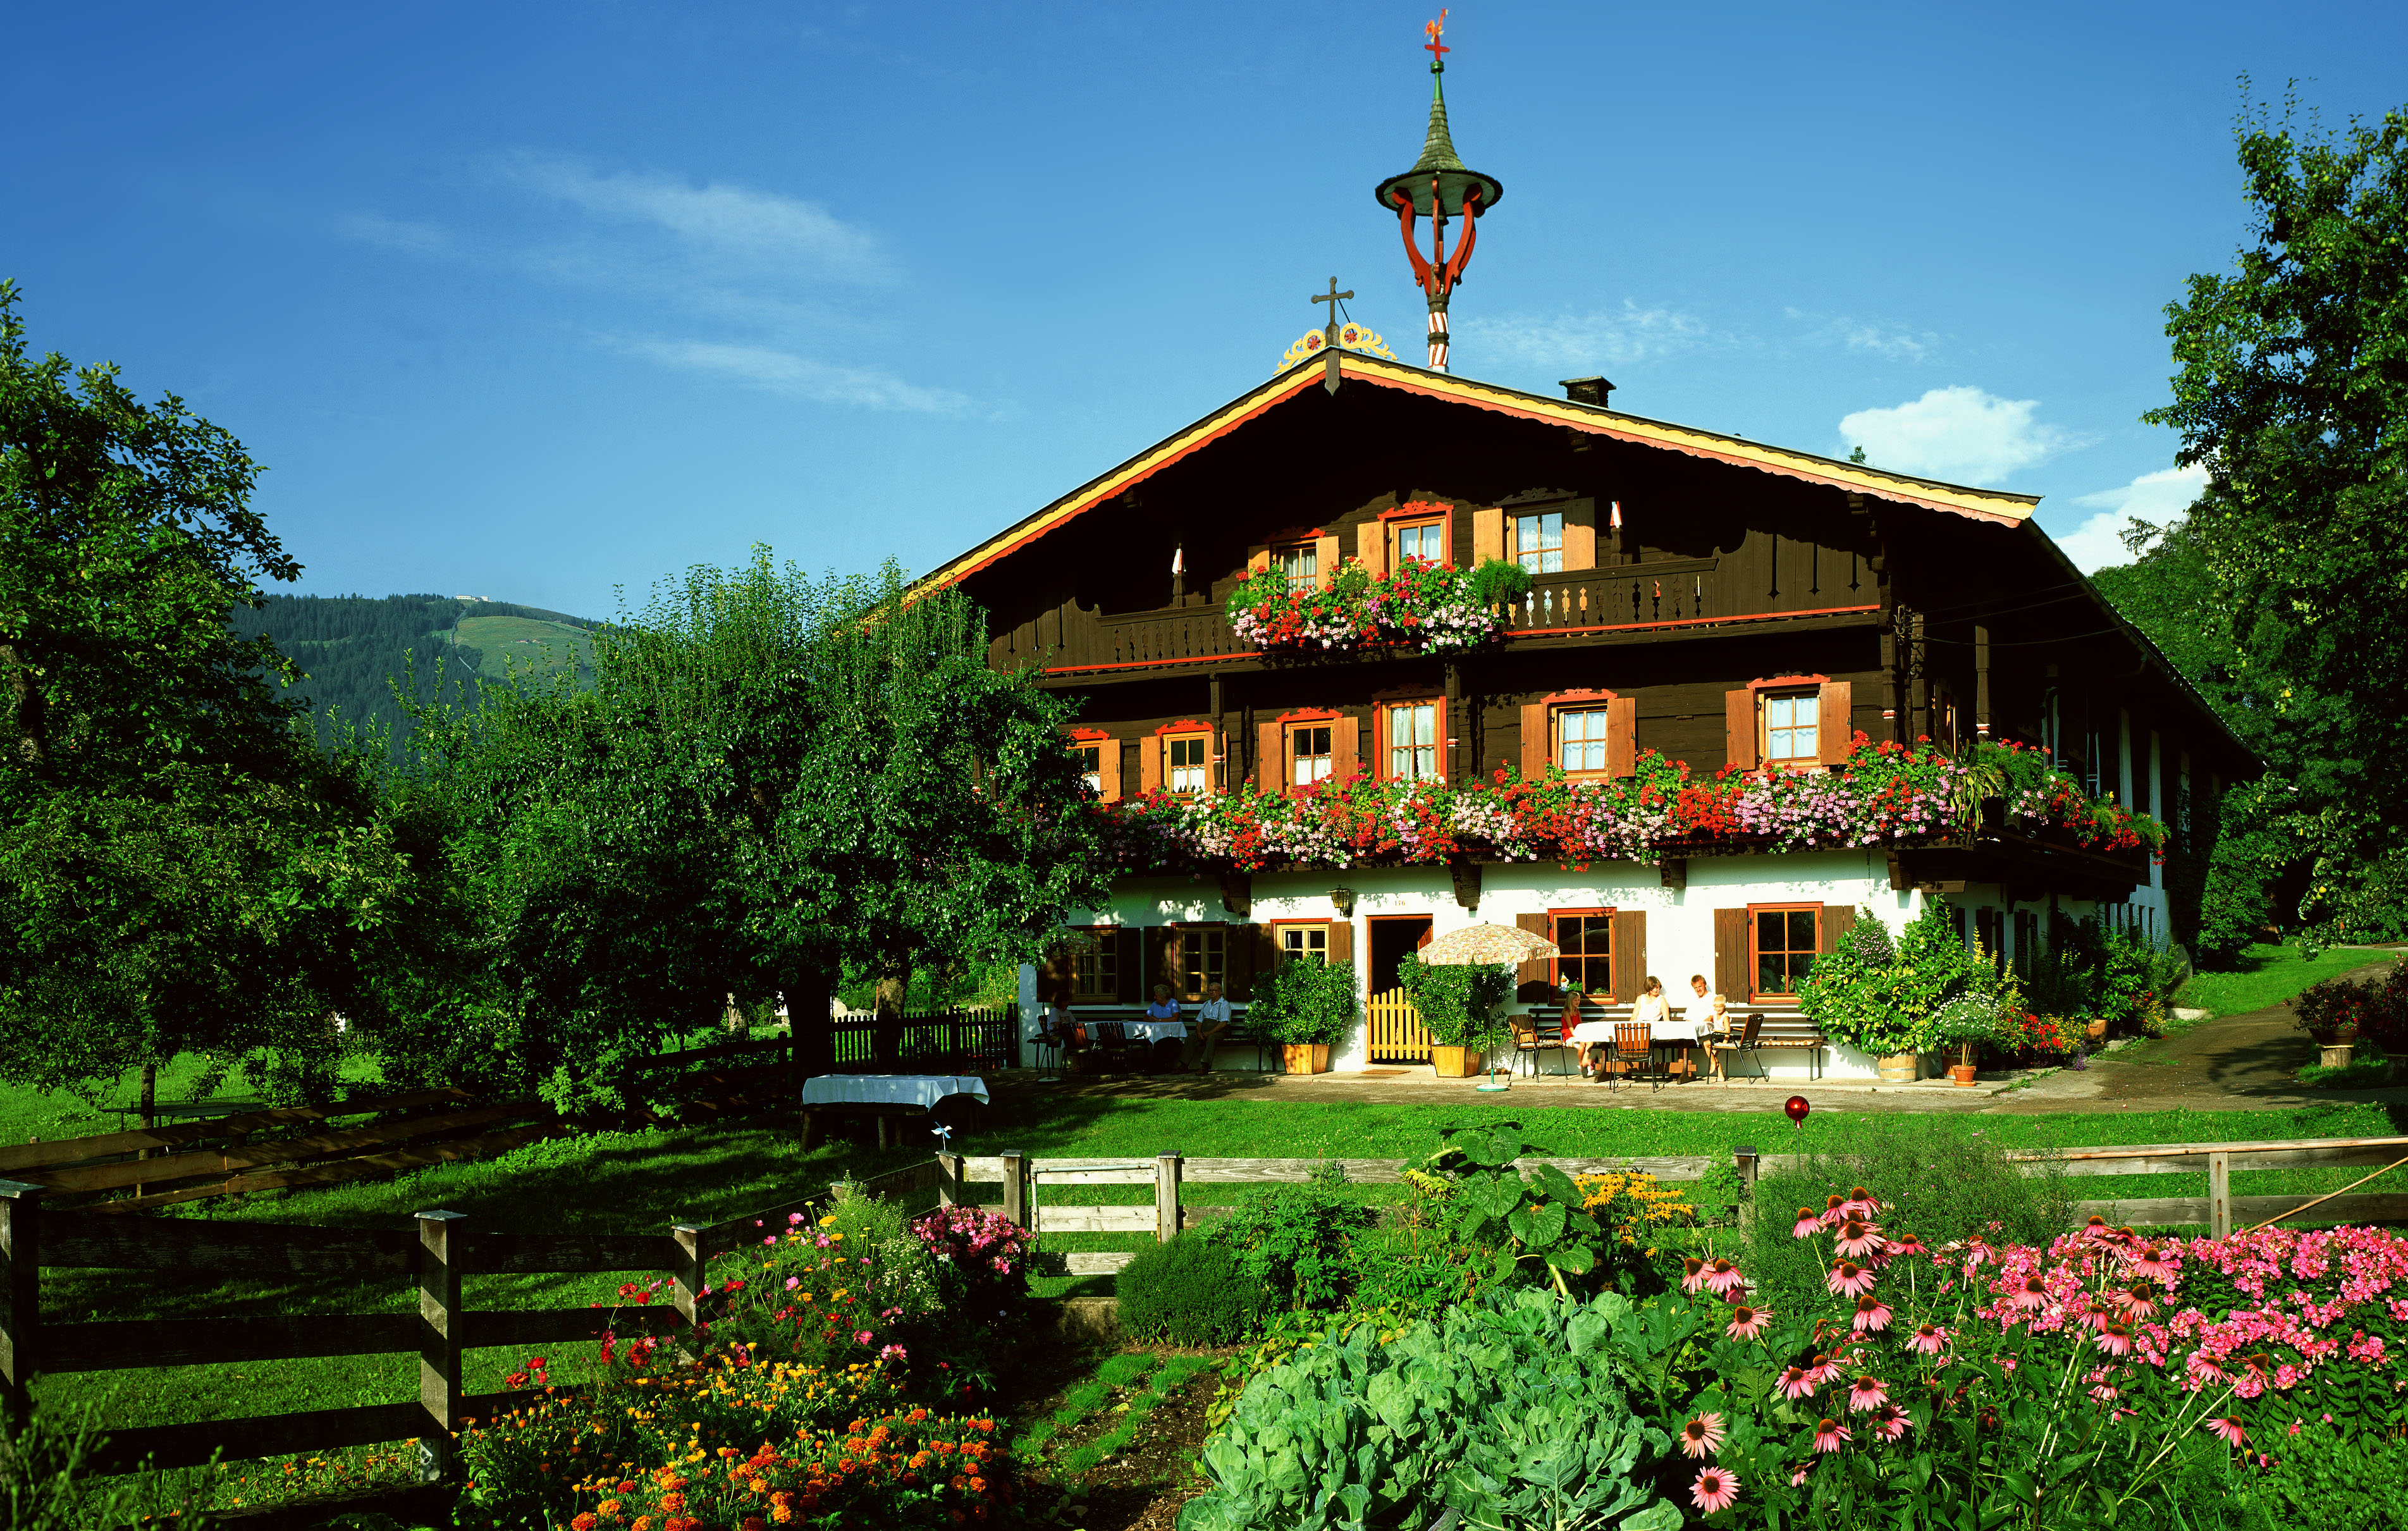 Tiroler Bauernhof